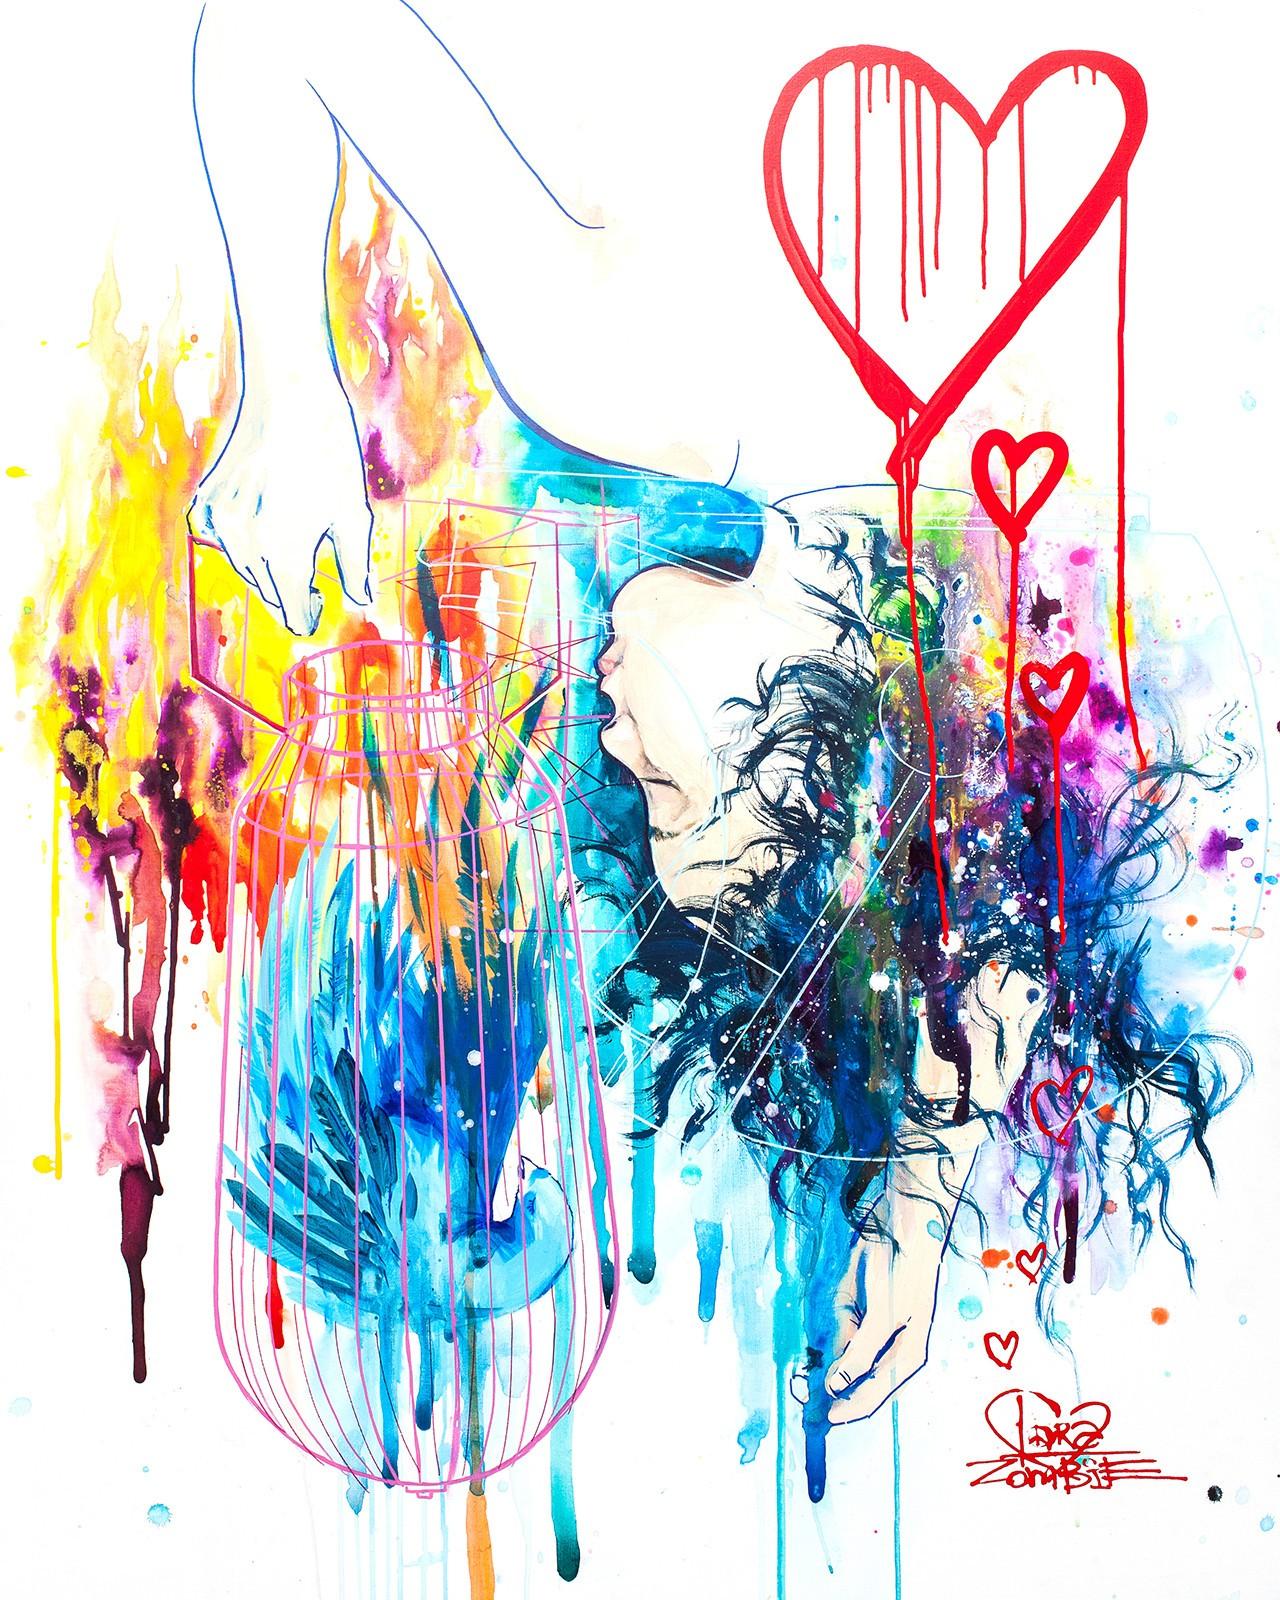 Fond d 39 cran color la peinture illustration dessin - Dessin colore ...